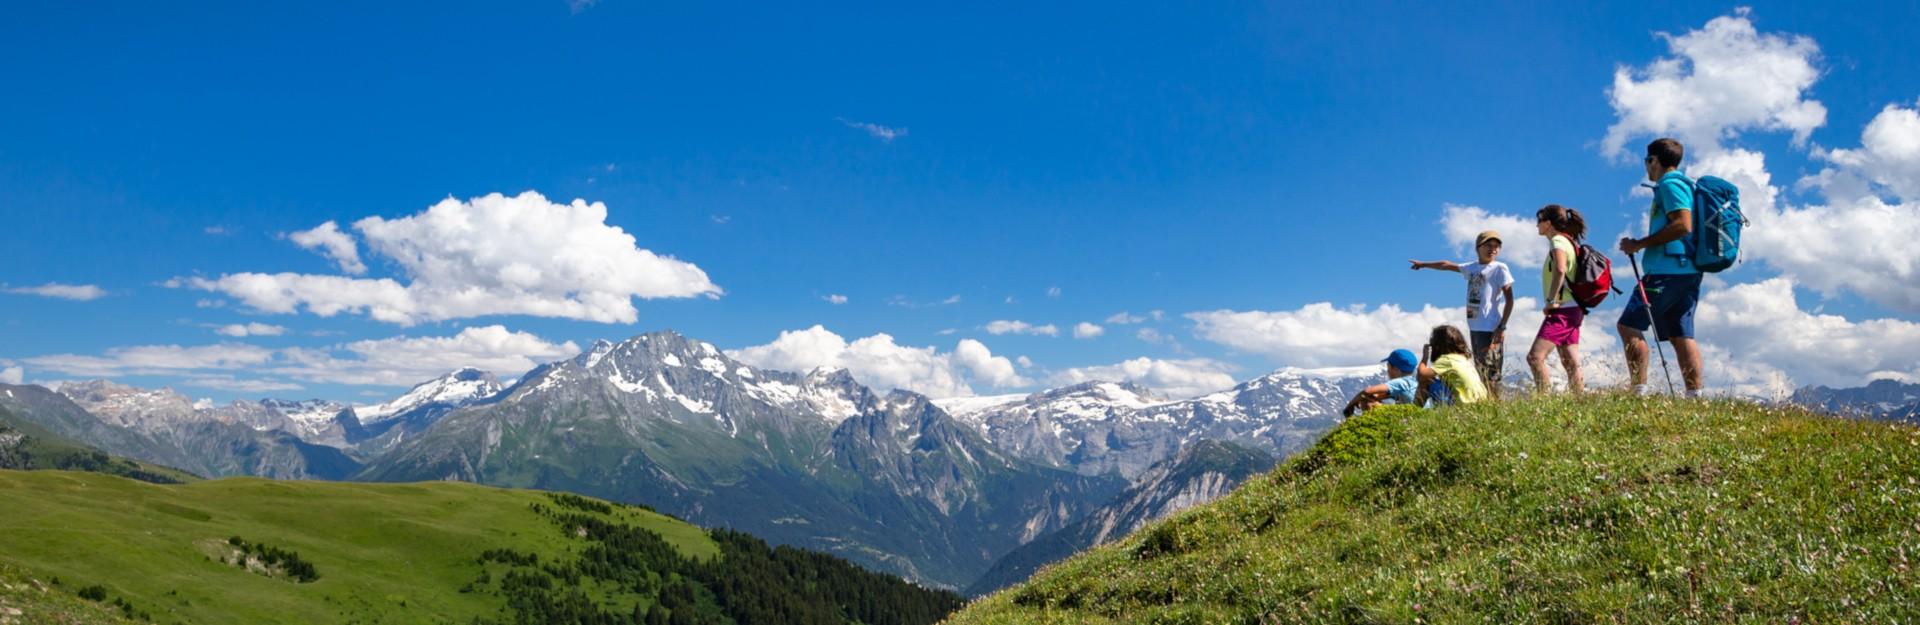 Randonnée Vallée de Bozel